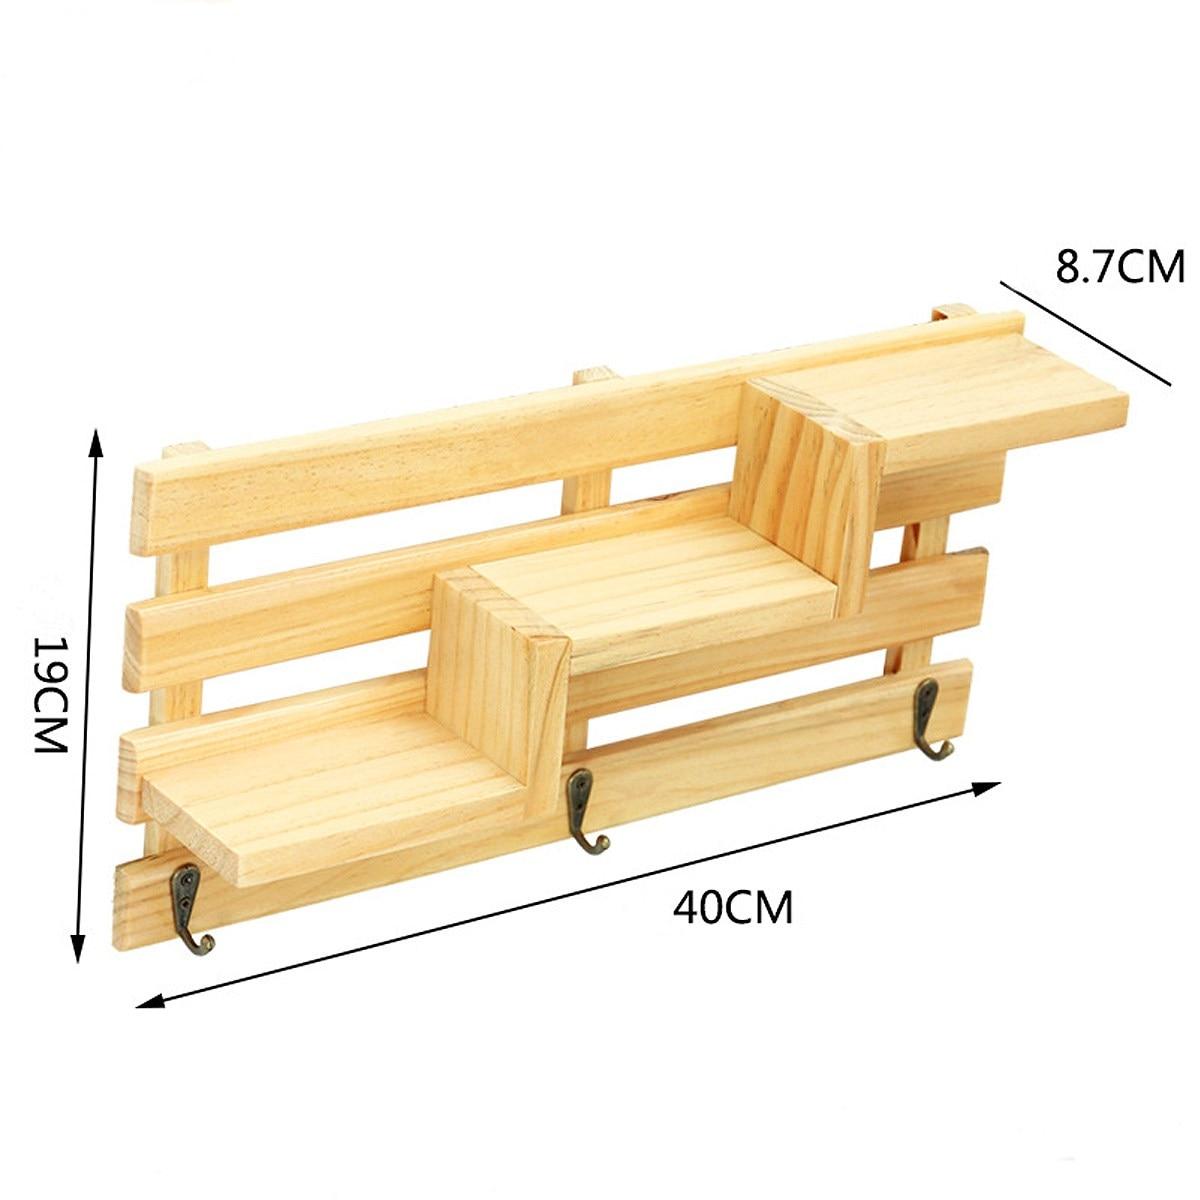 New 3 Colors Bedroom Wall Shelves Original Wood Chic Rack Storage ...